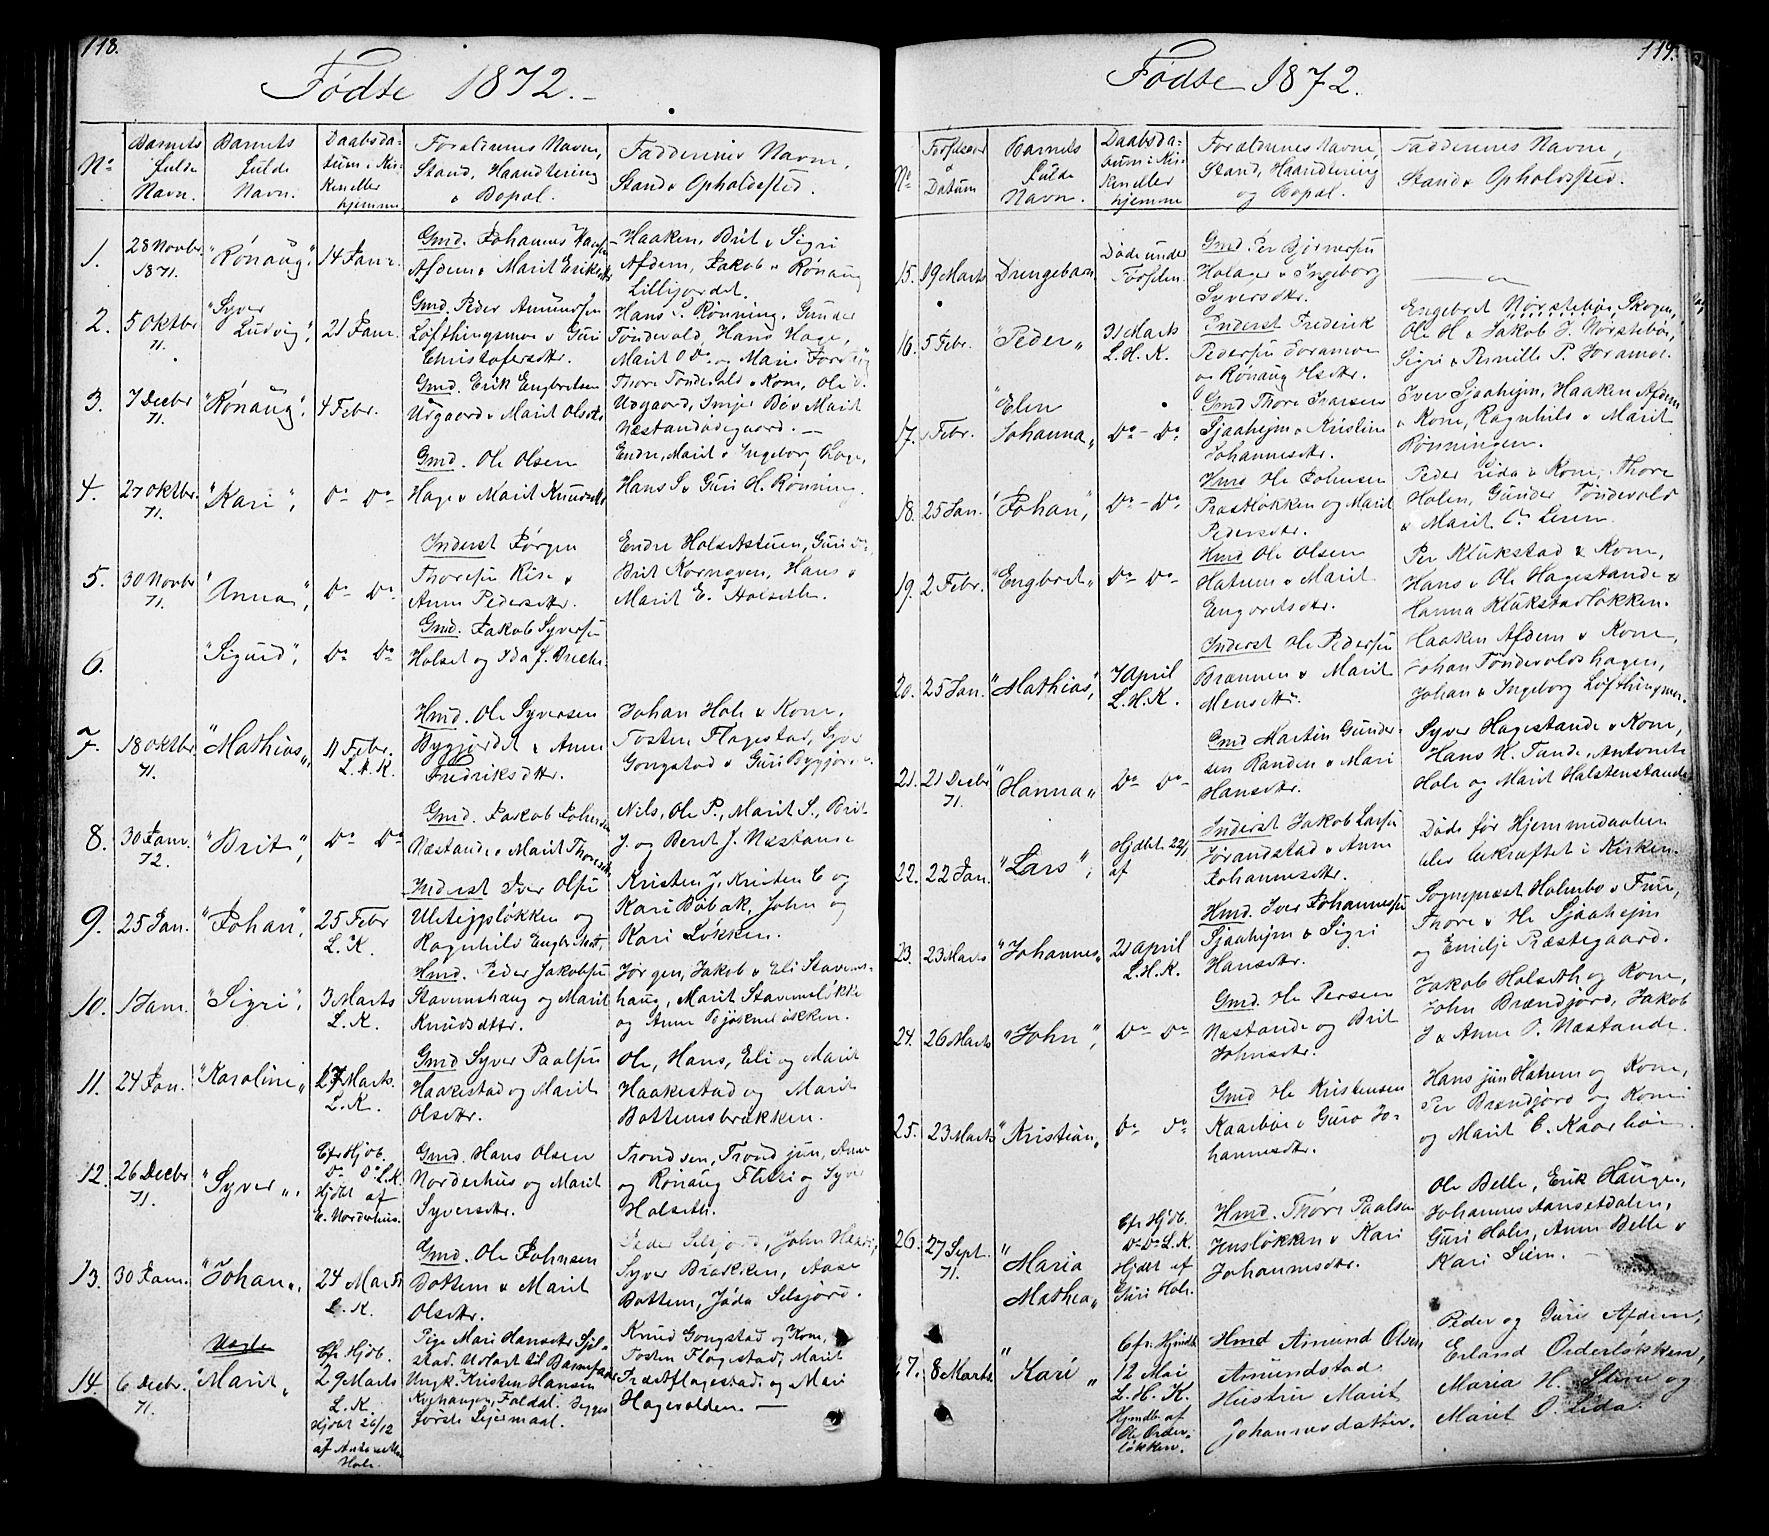 SAH, Lesja prestekontor, Klokkerbok nr. 5, 1850-1894, s. 118-119